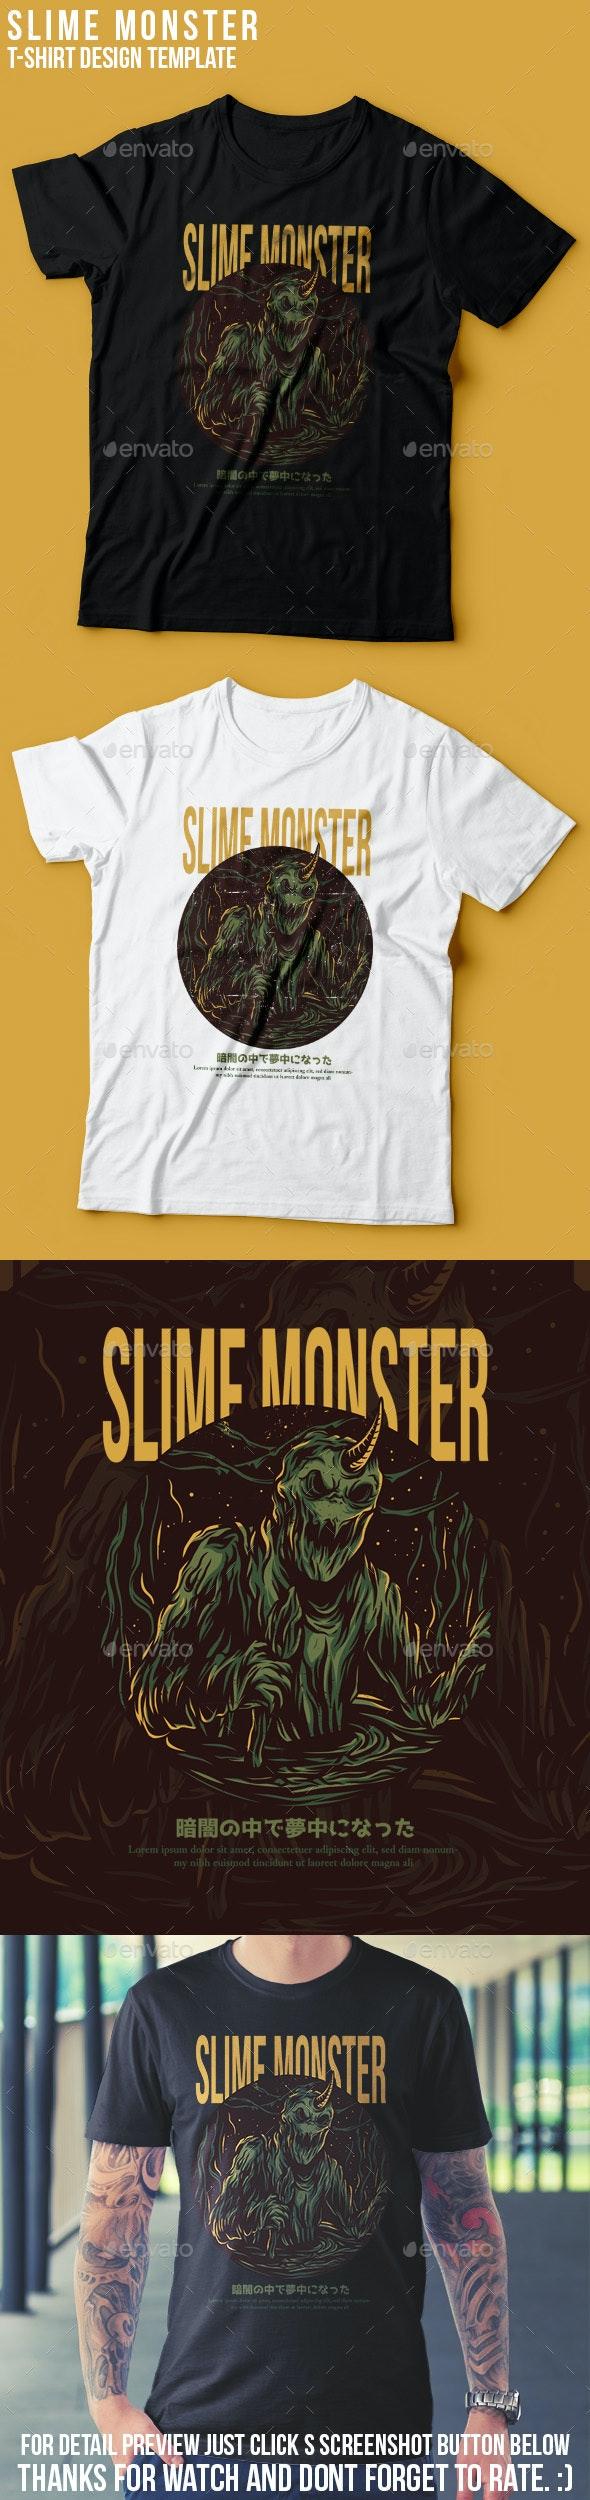 Slime Monster T-Shirt Design - Grunge Designs